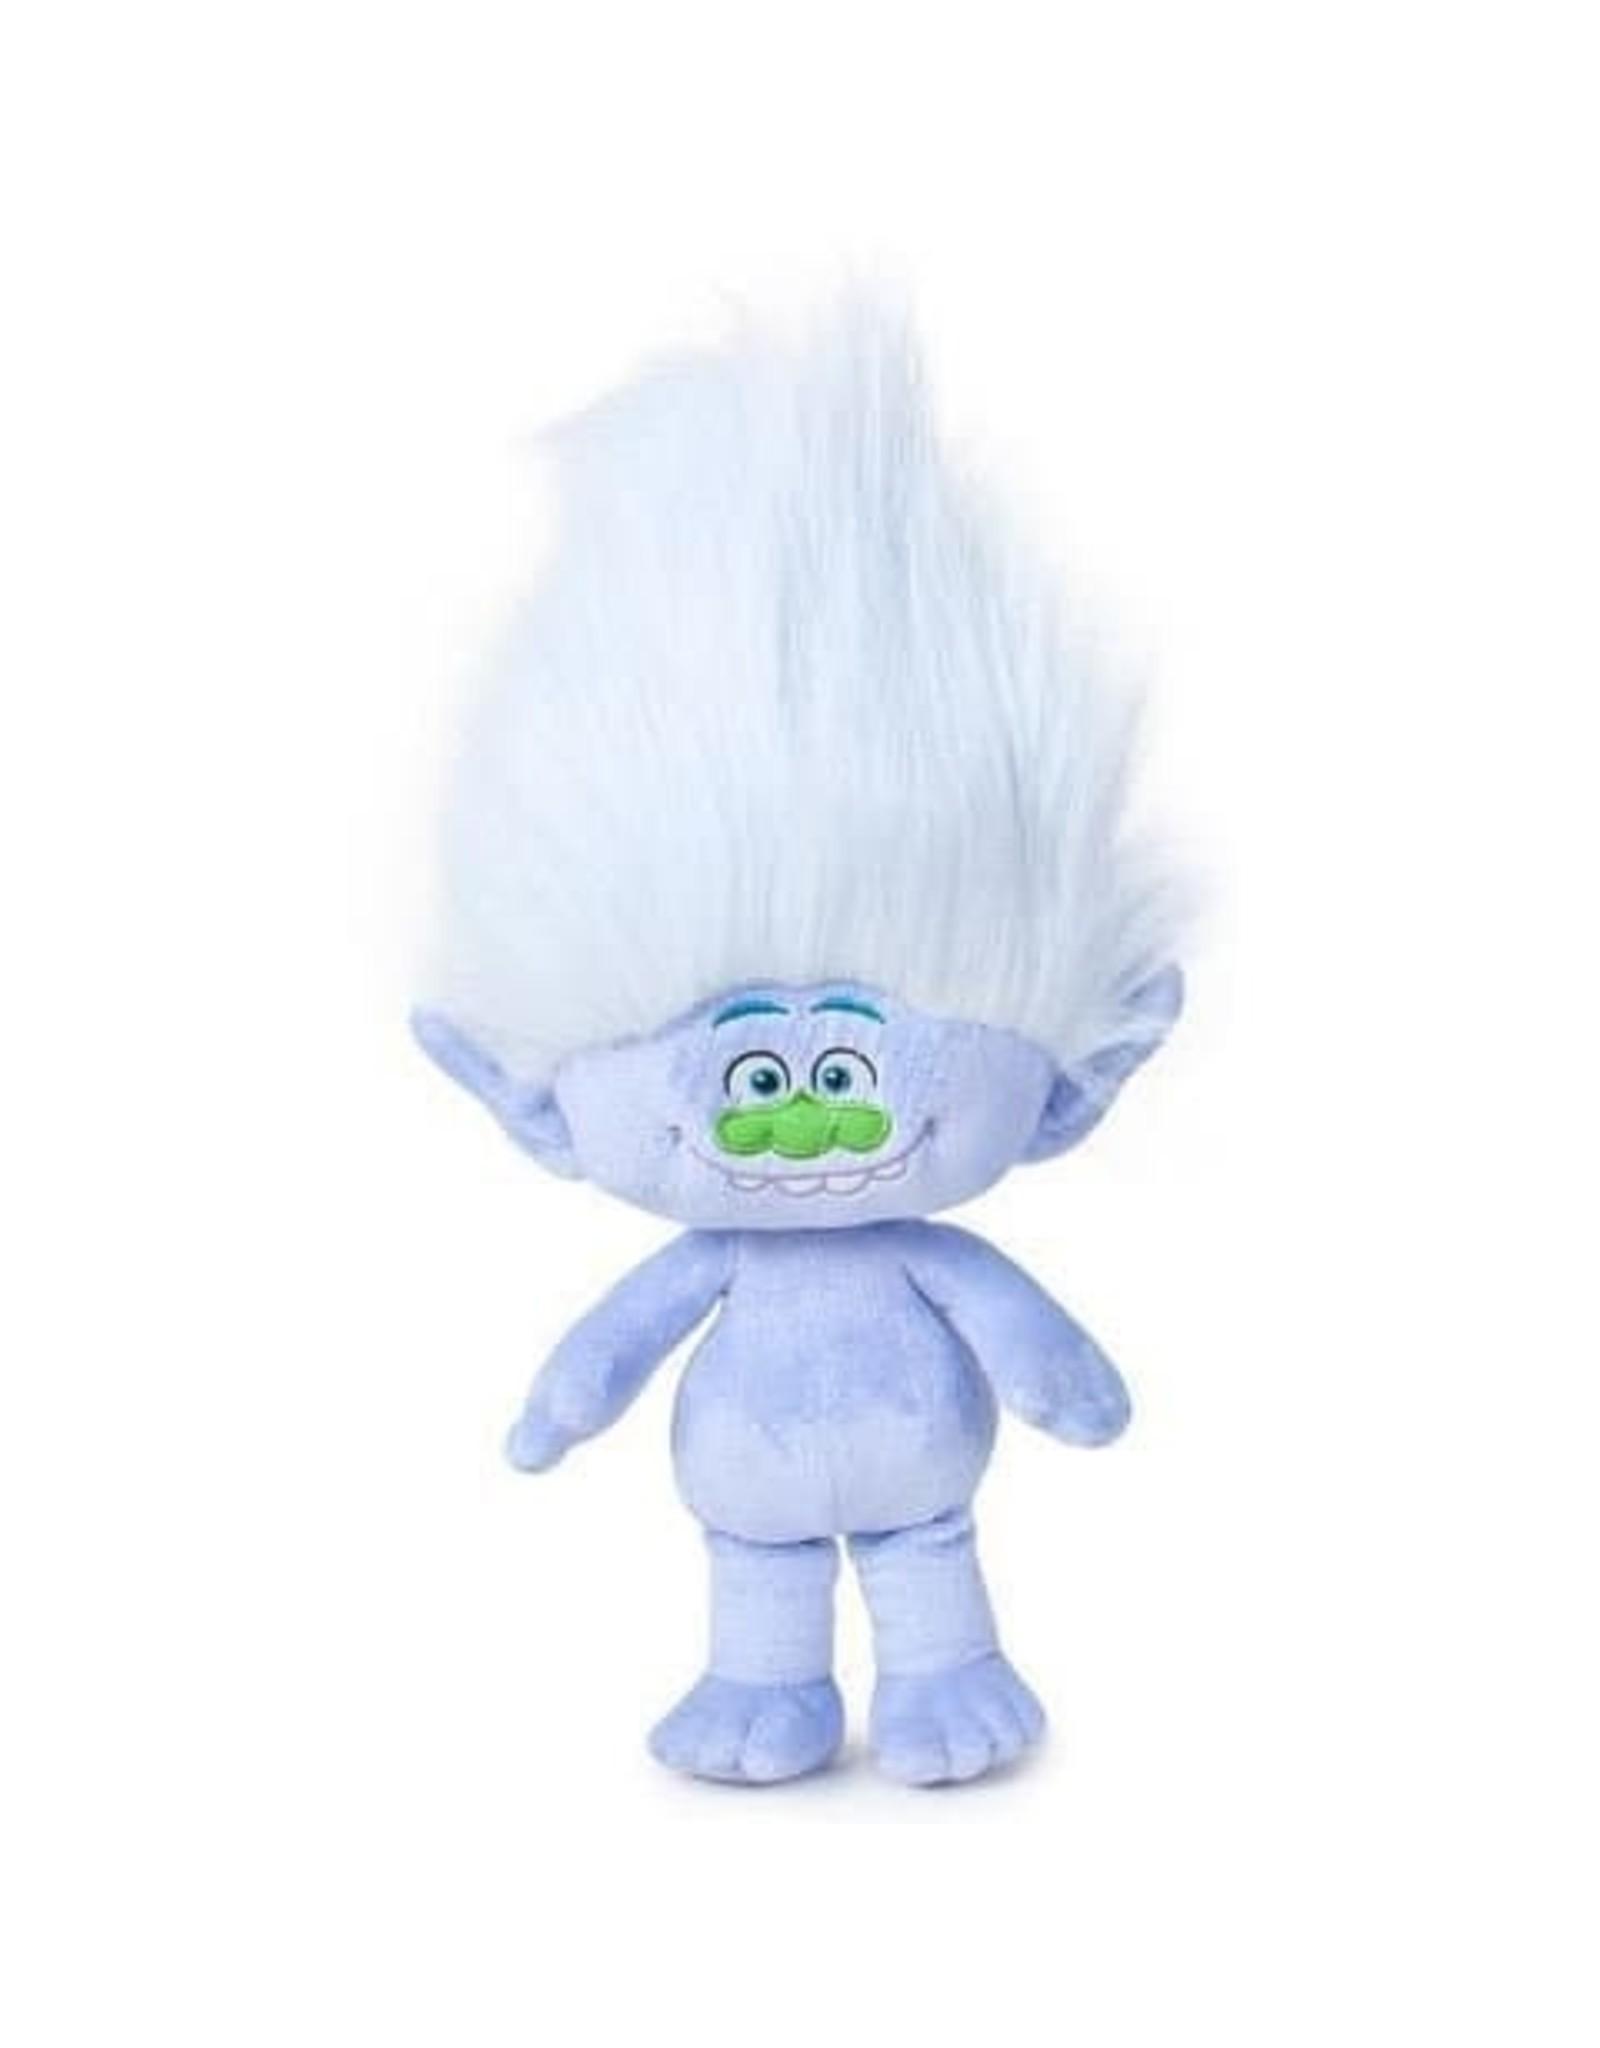 Trolls Merchandise toys - Diamond Trolls Plush doll